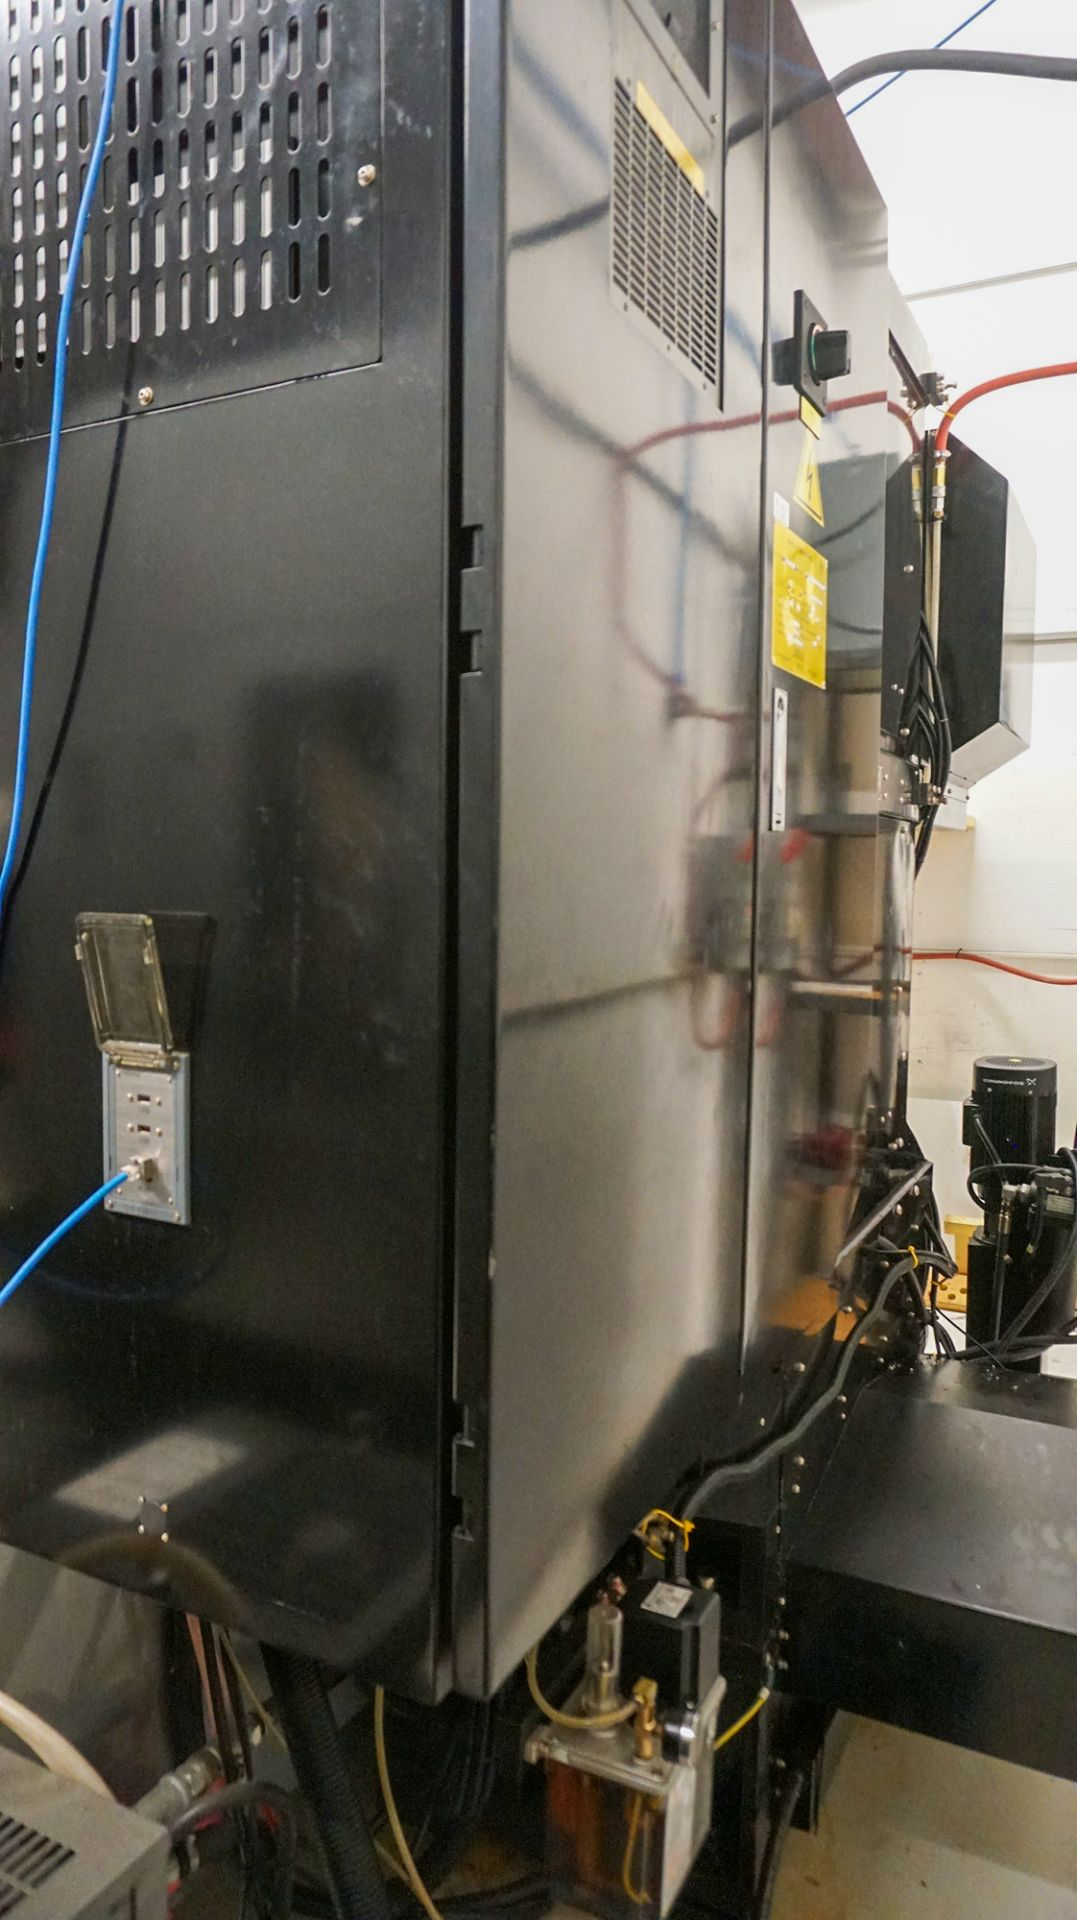 HURCO (2012) VMX42UI 5 AXIS CNC VERTICAL MACHINING CENTER WITH HURCO DUAL SCREEN CNC CONTROL, 13. - Image 17 of 20